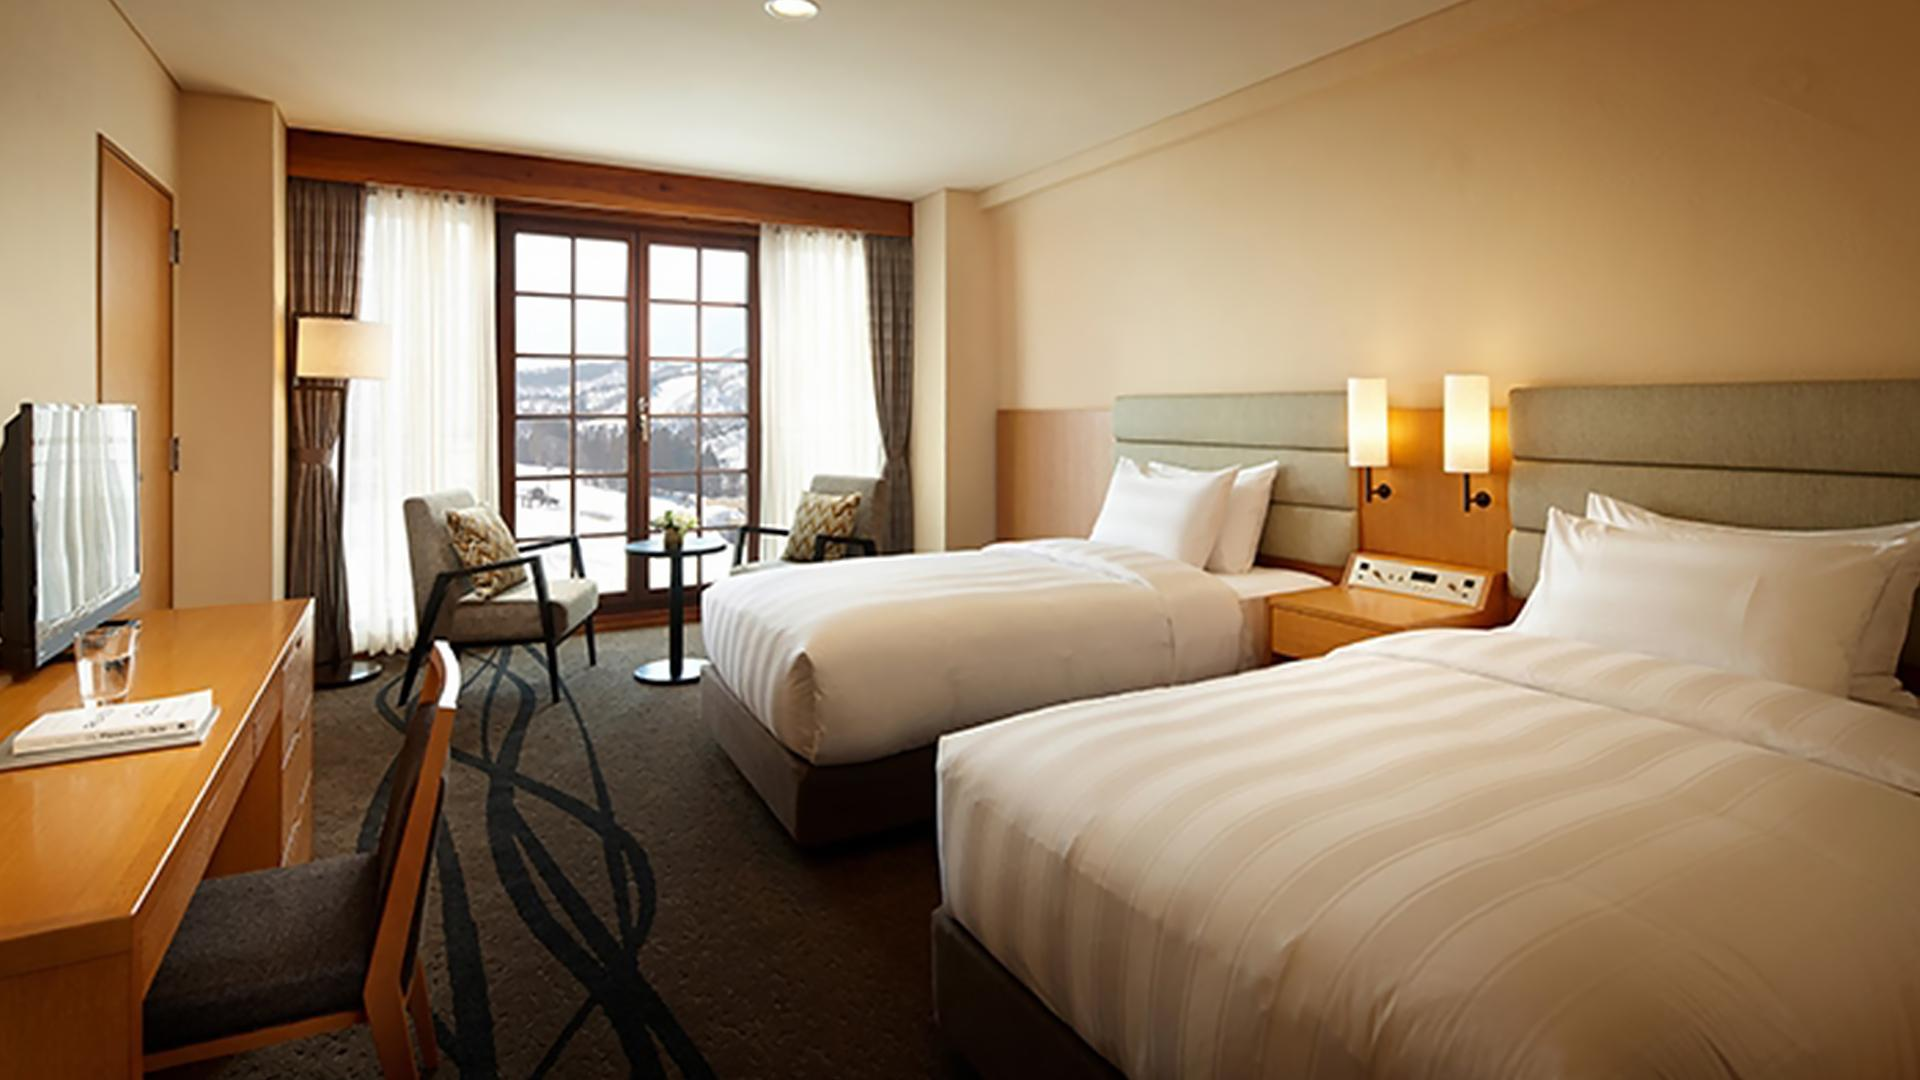 Superior Twin Room image 1 at Lotte Arai Resort by null, Niigata, Japan